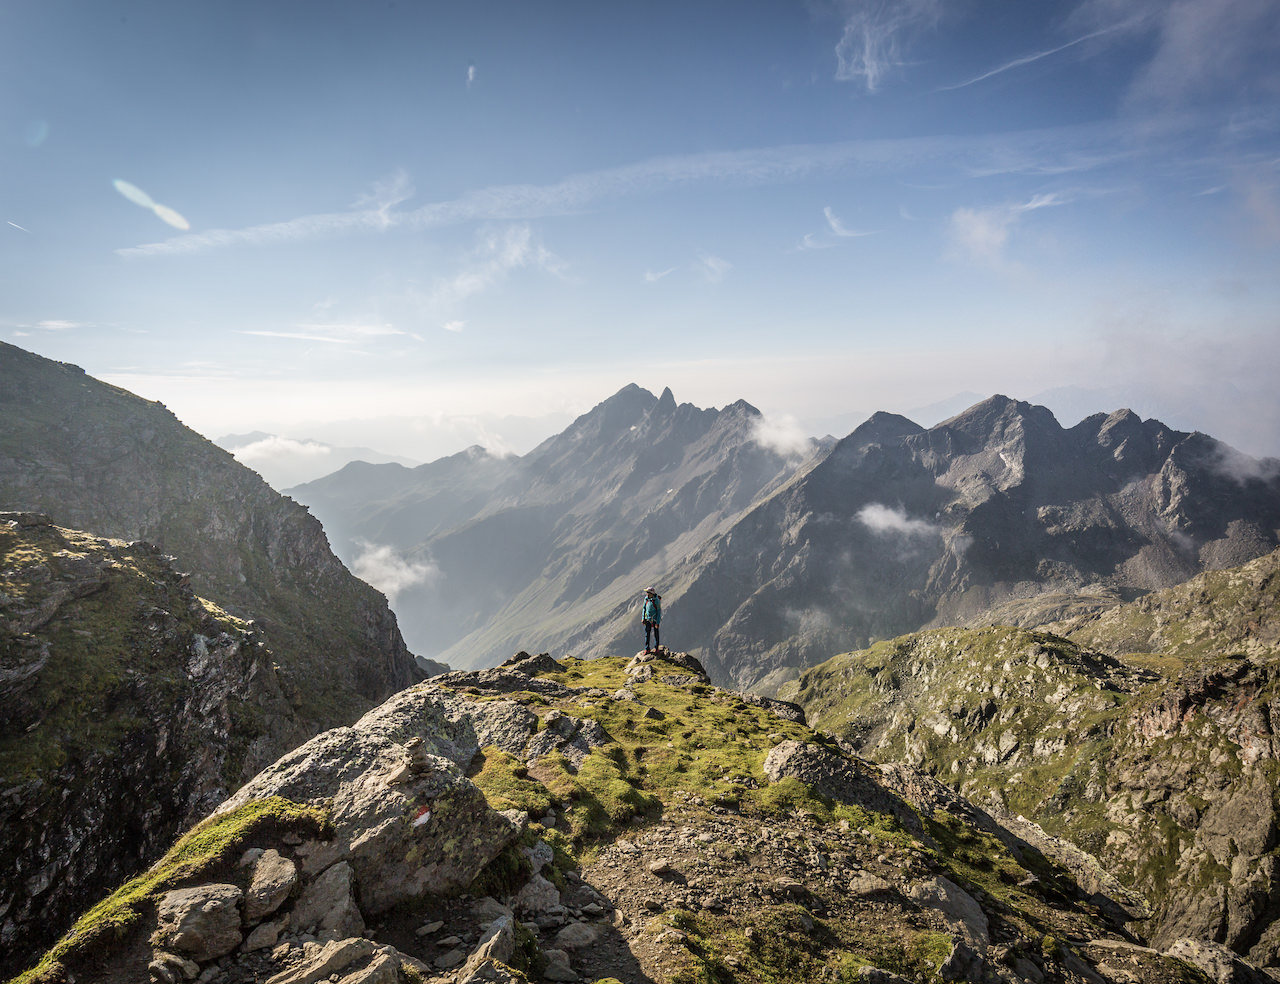 Wandern in der Schobergruppe, Nationalpark Hohe Tauern